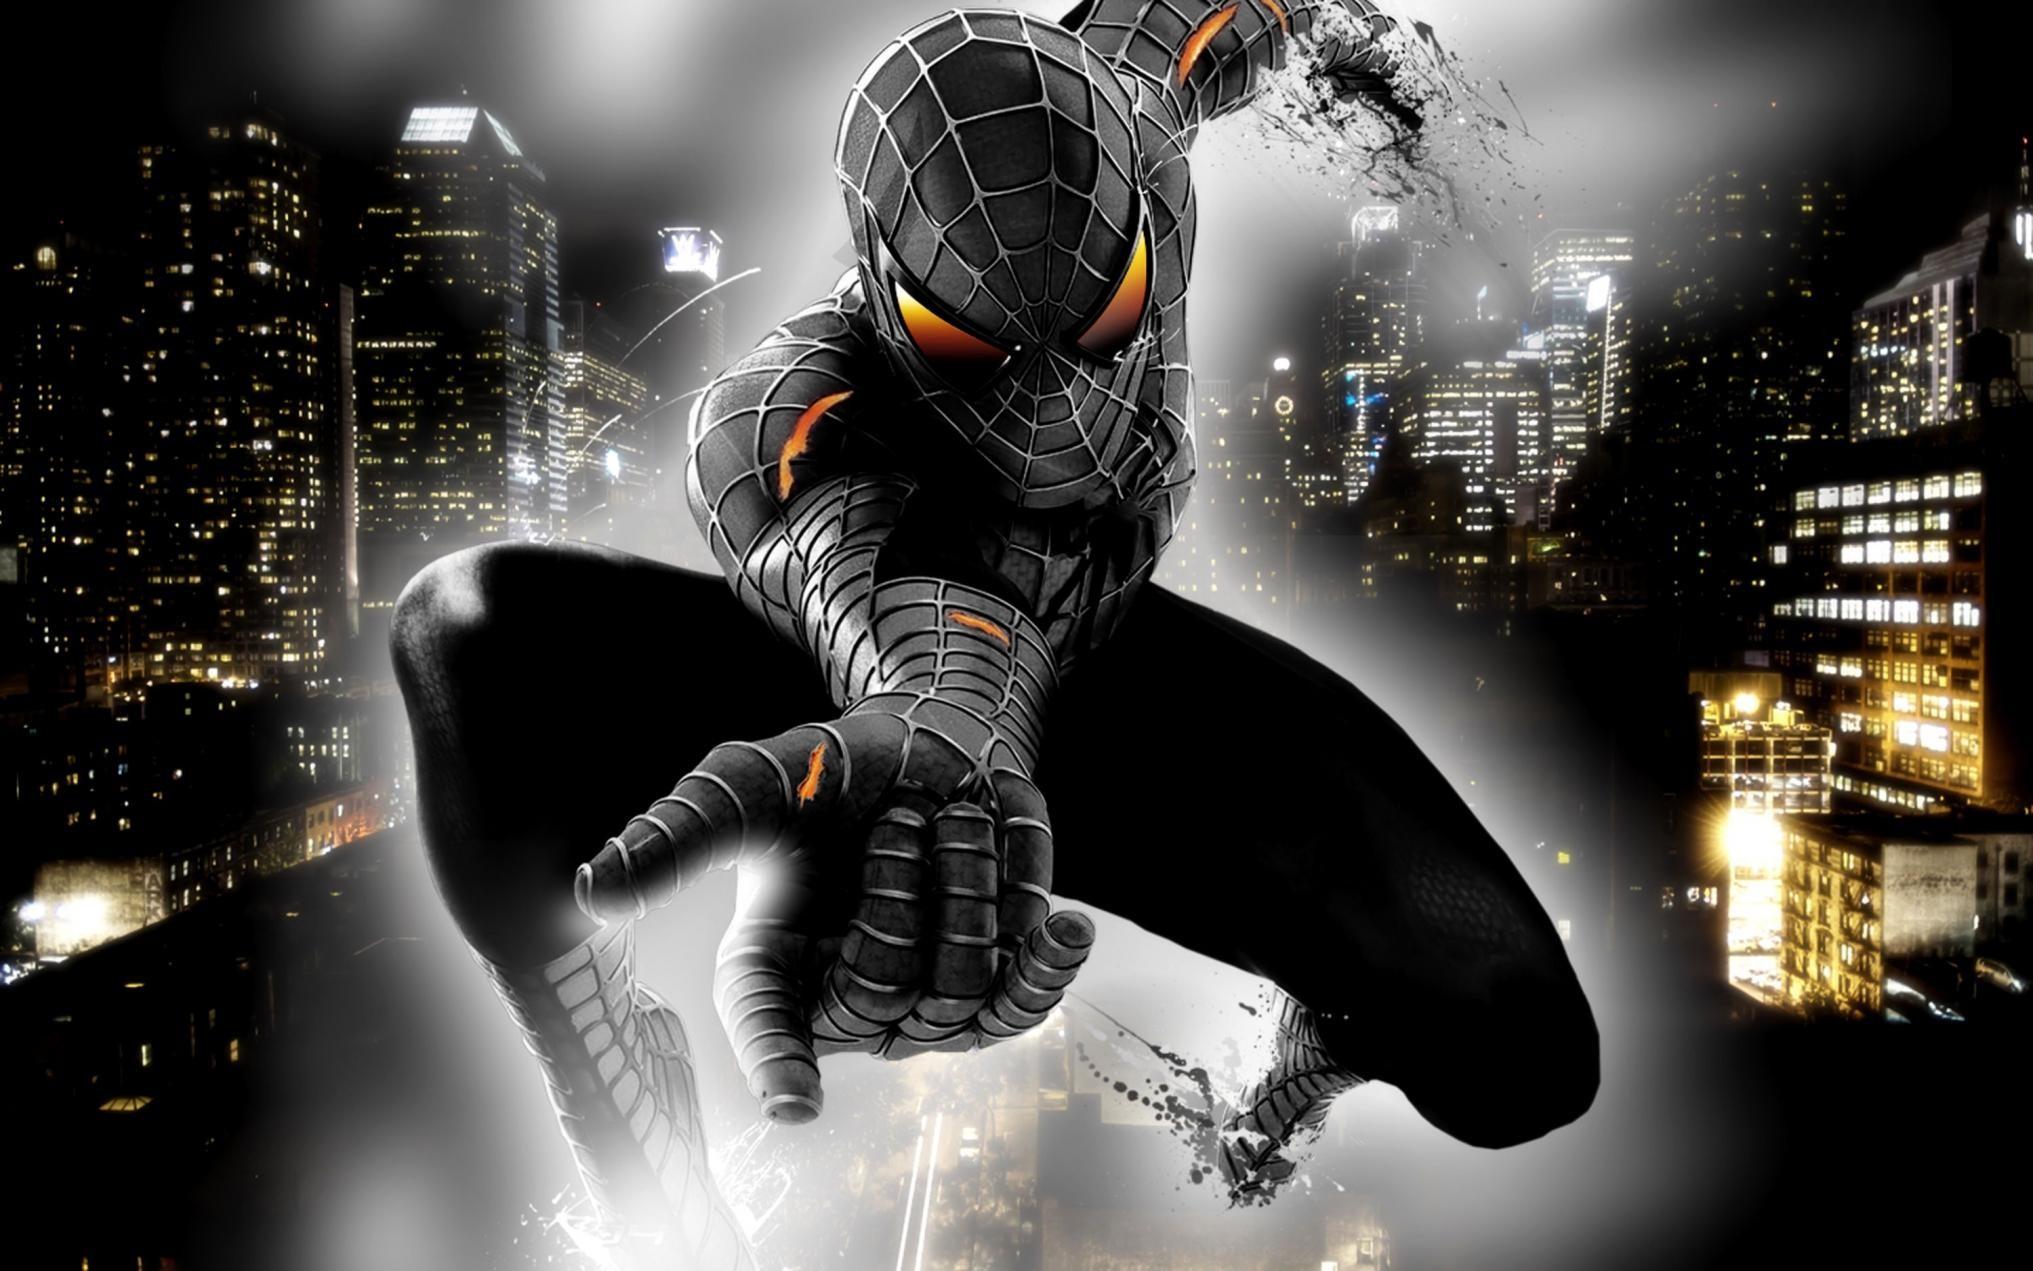 Black Spiderman Iphone Desktop Wallpaper.